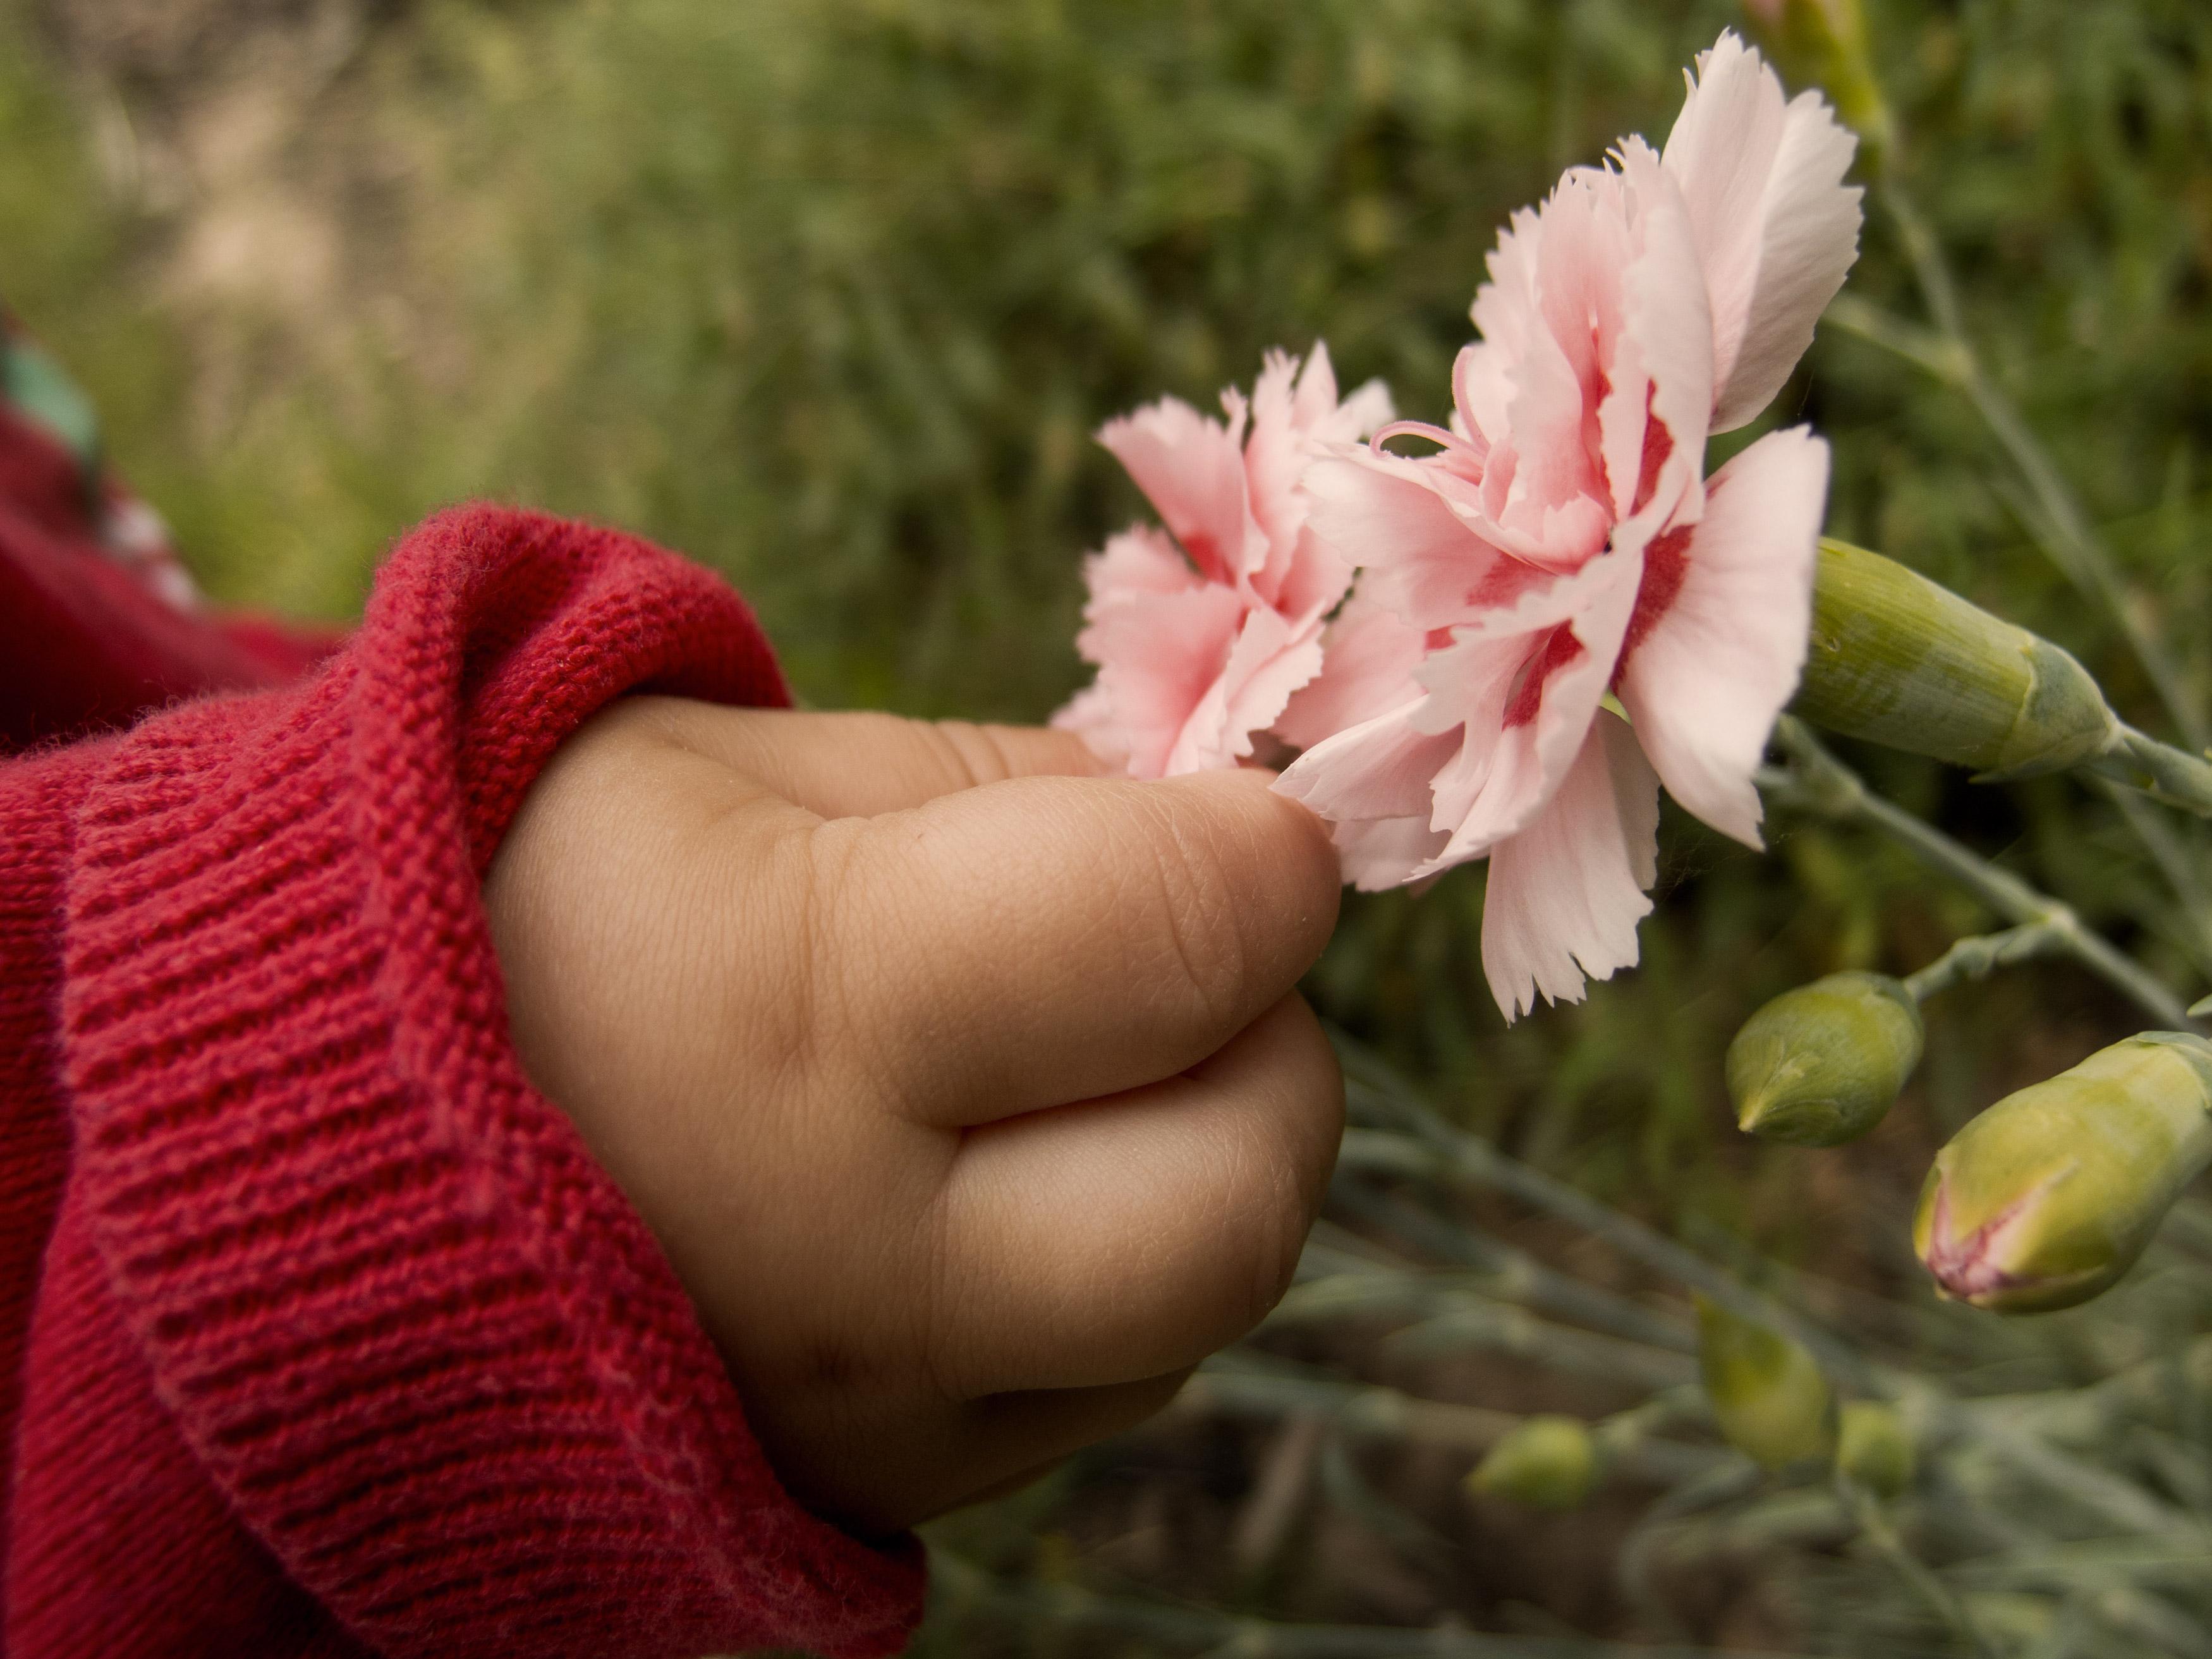 free image baby hand picking the flower libreshot public domain